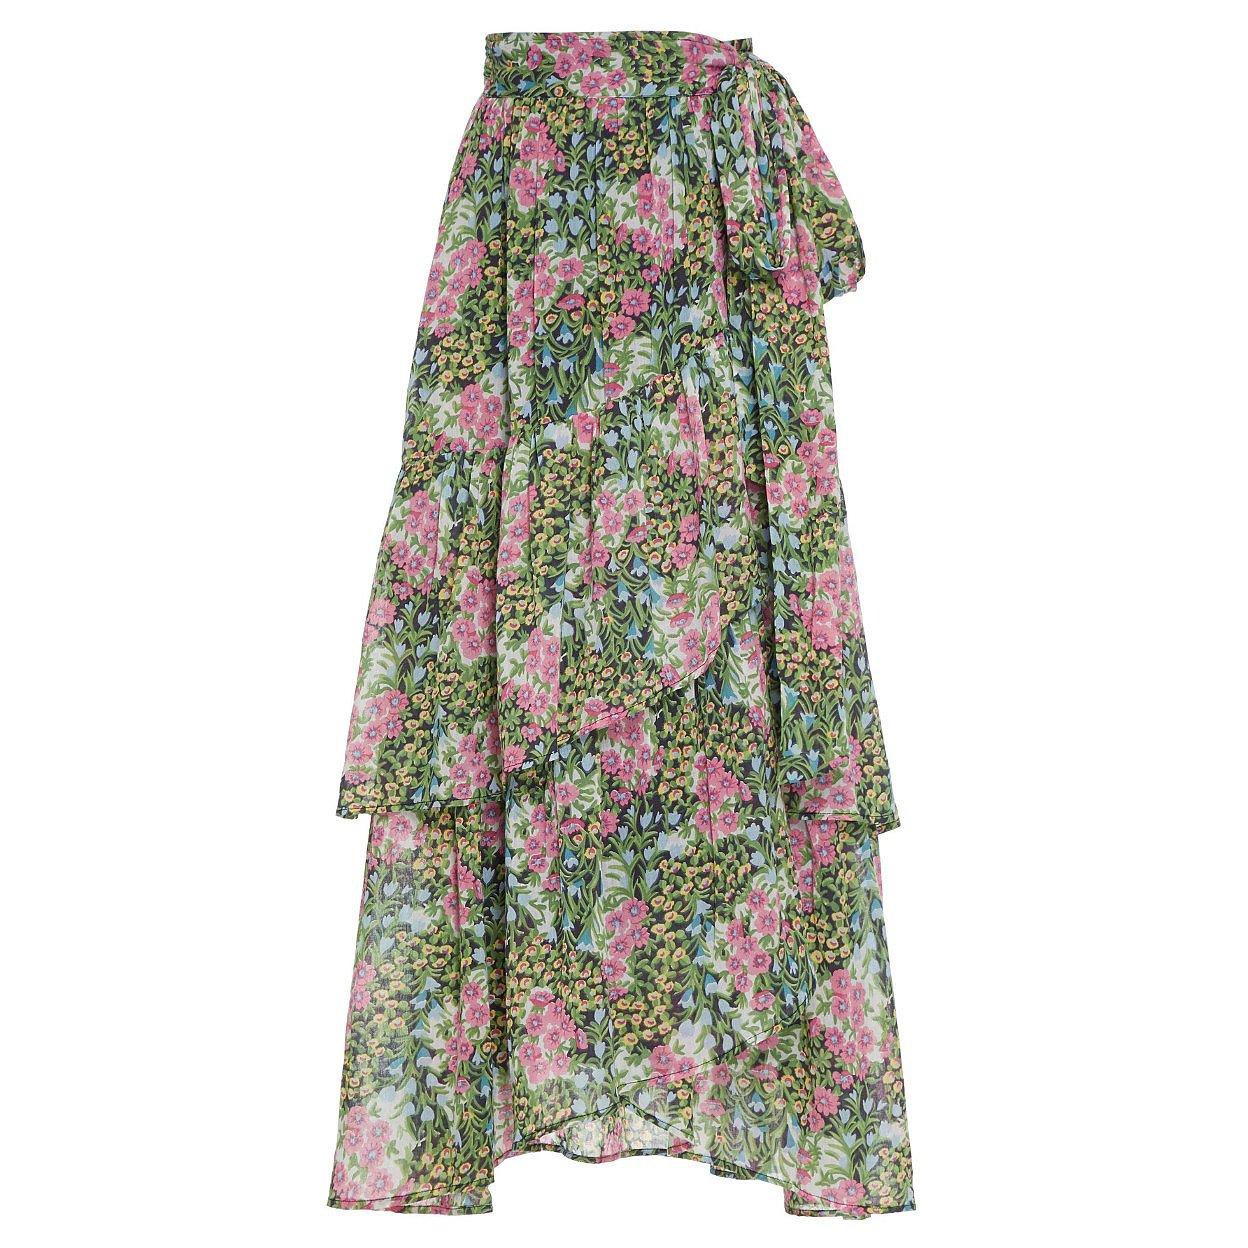 Banjanan Frances Floral Wrap Skirt